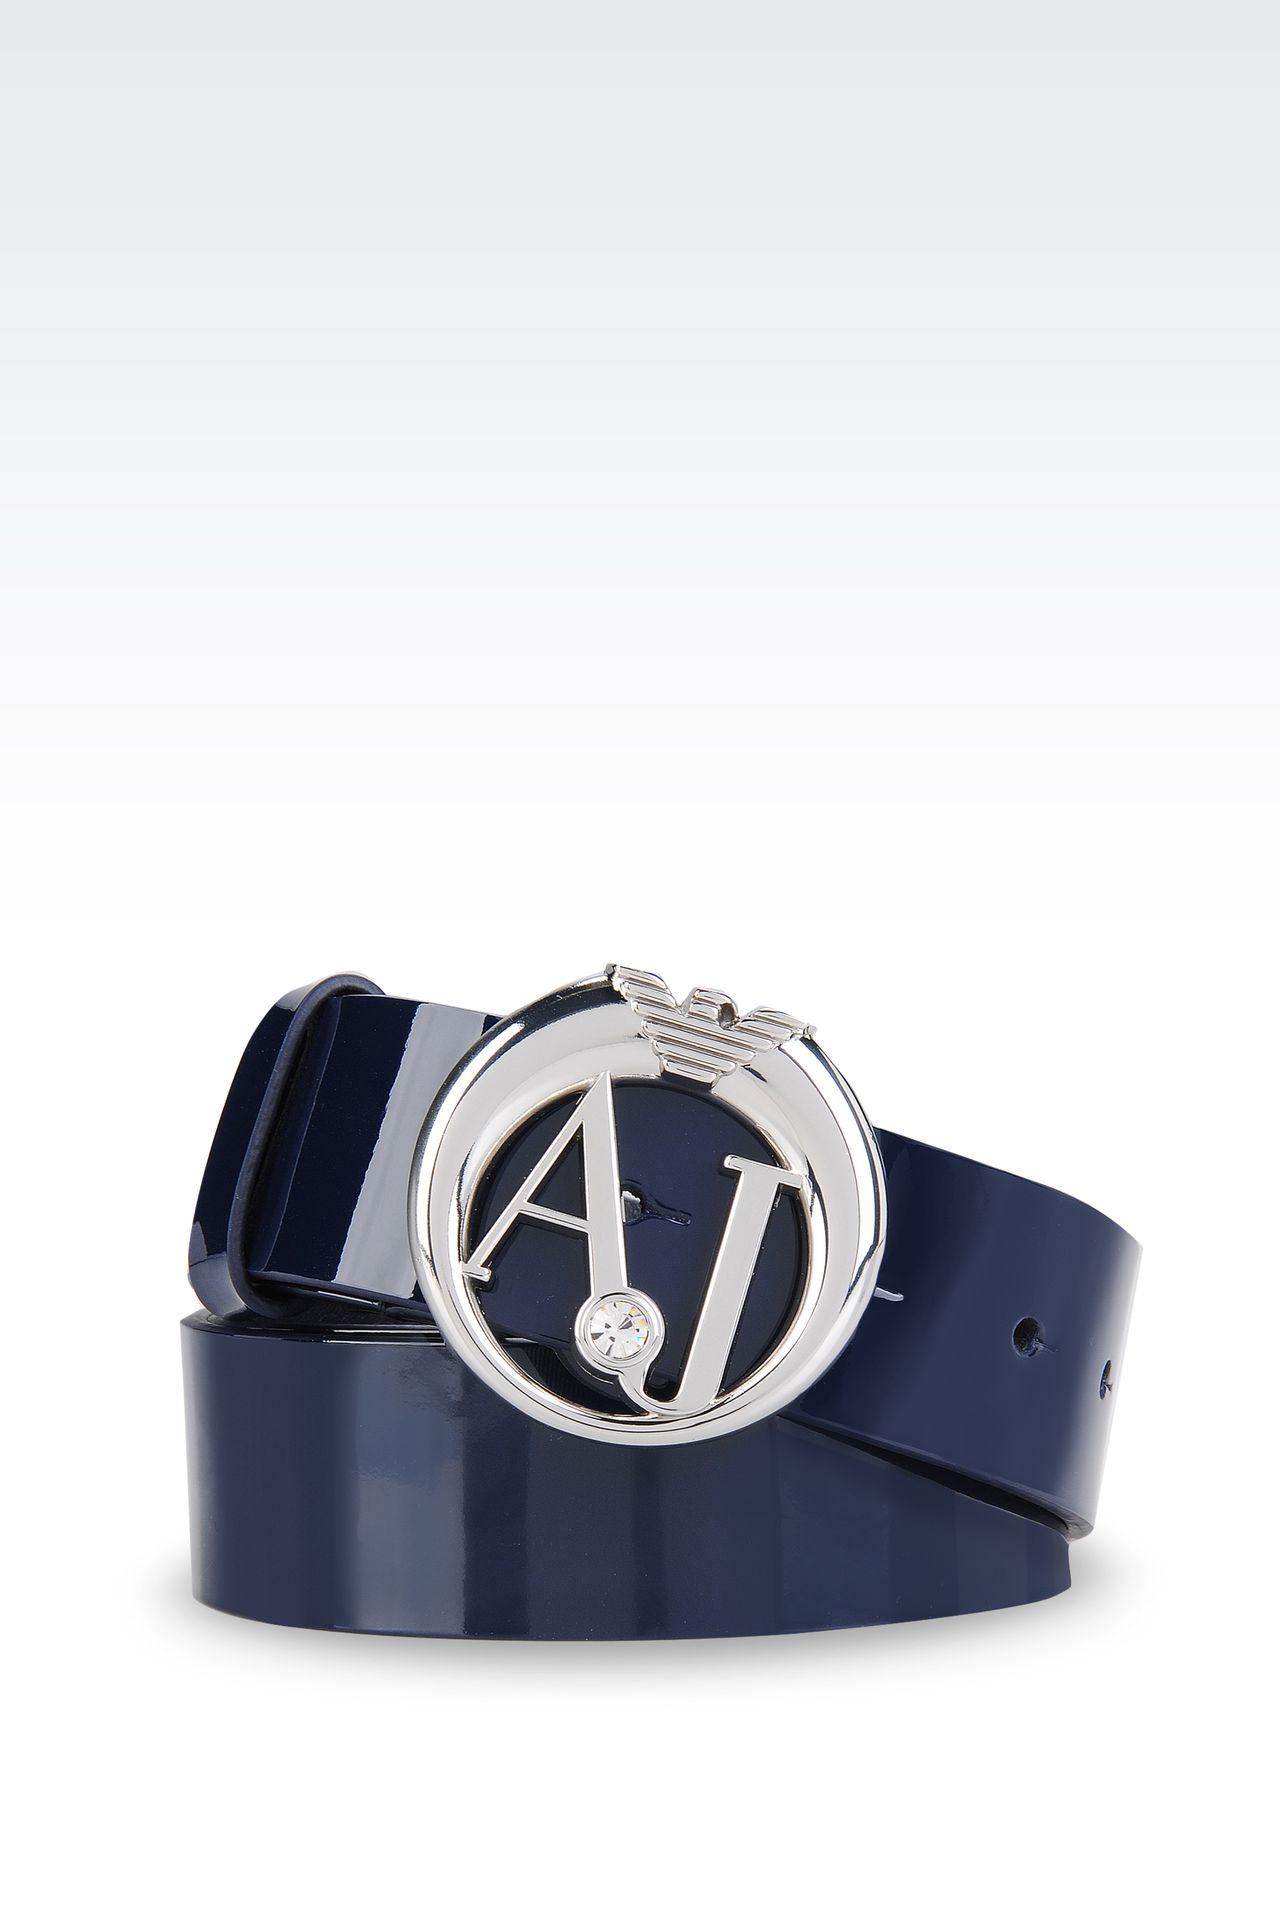 vasta selezione di 0fa15 8acd8 Cintura Armani Jeans Blu itissgv.it